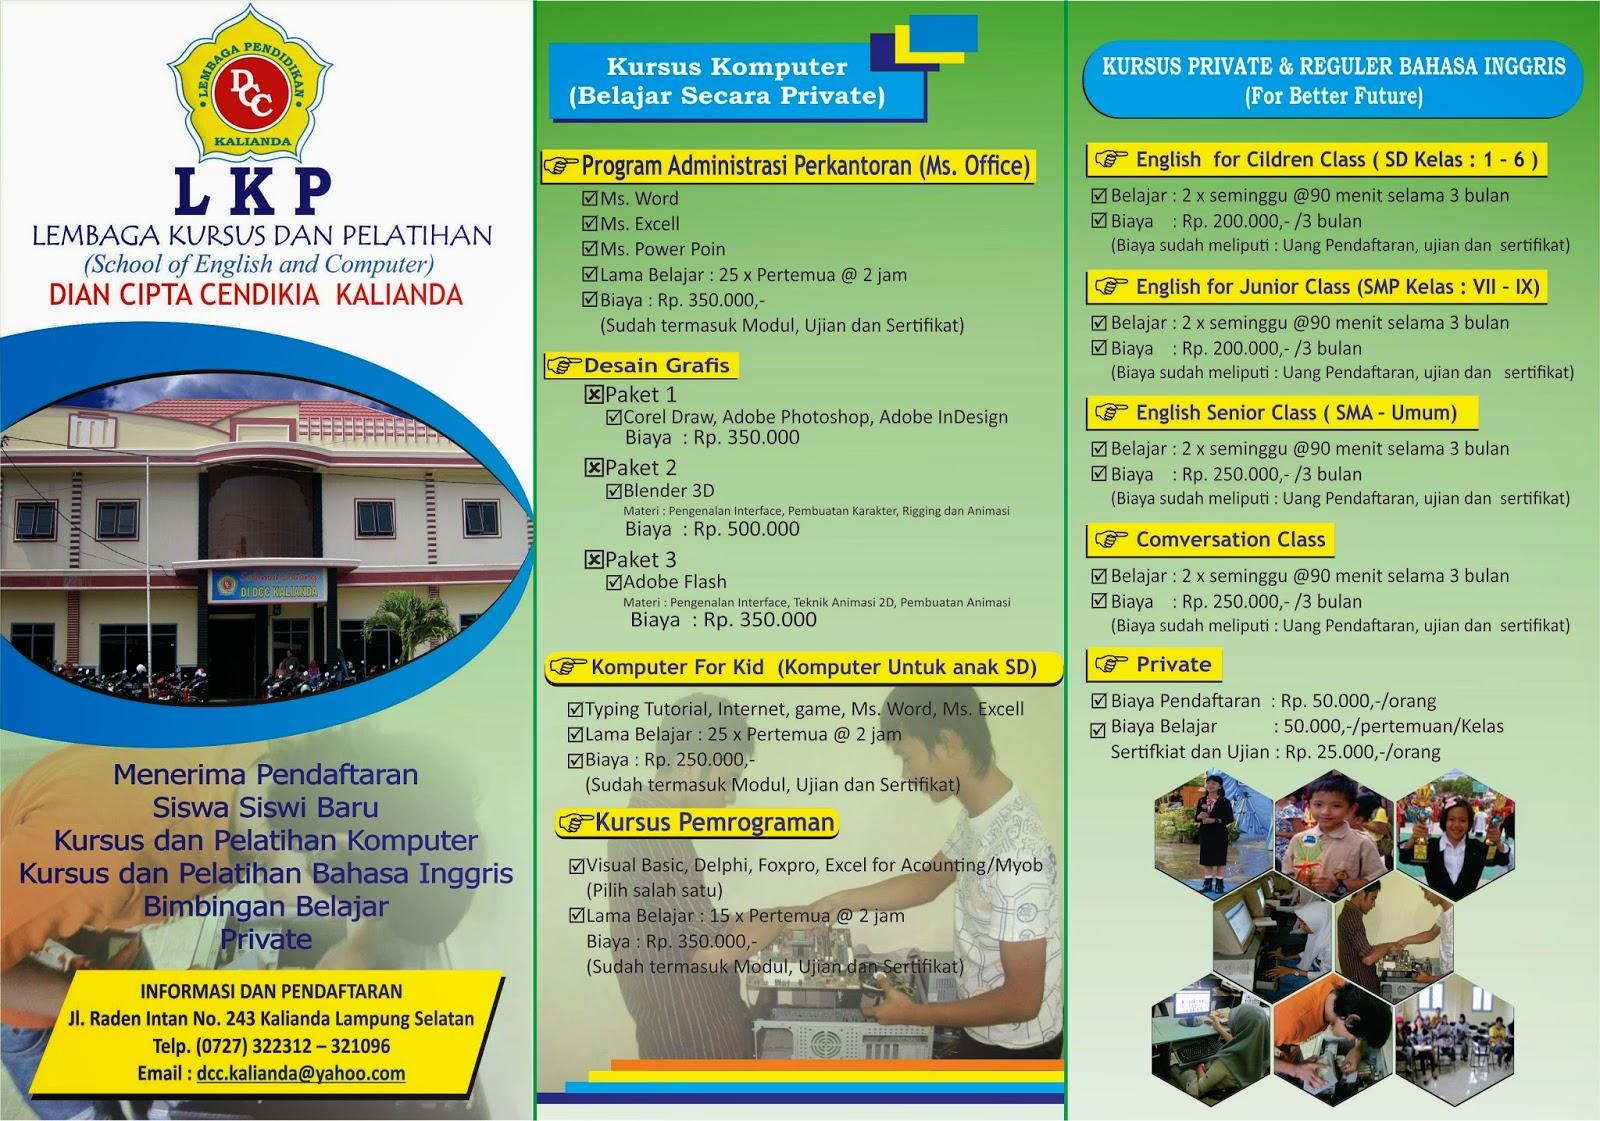 Brosur Untuk Pendidikan Madrasah Menggunakan CorelDRAW